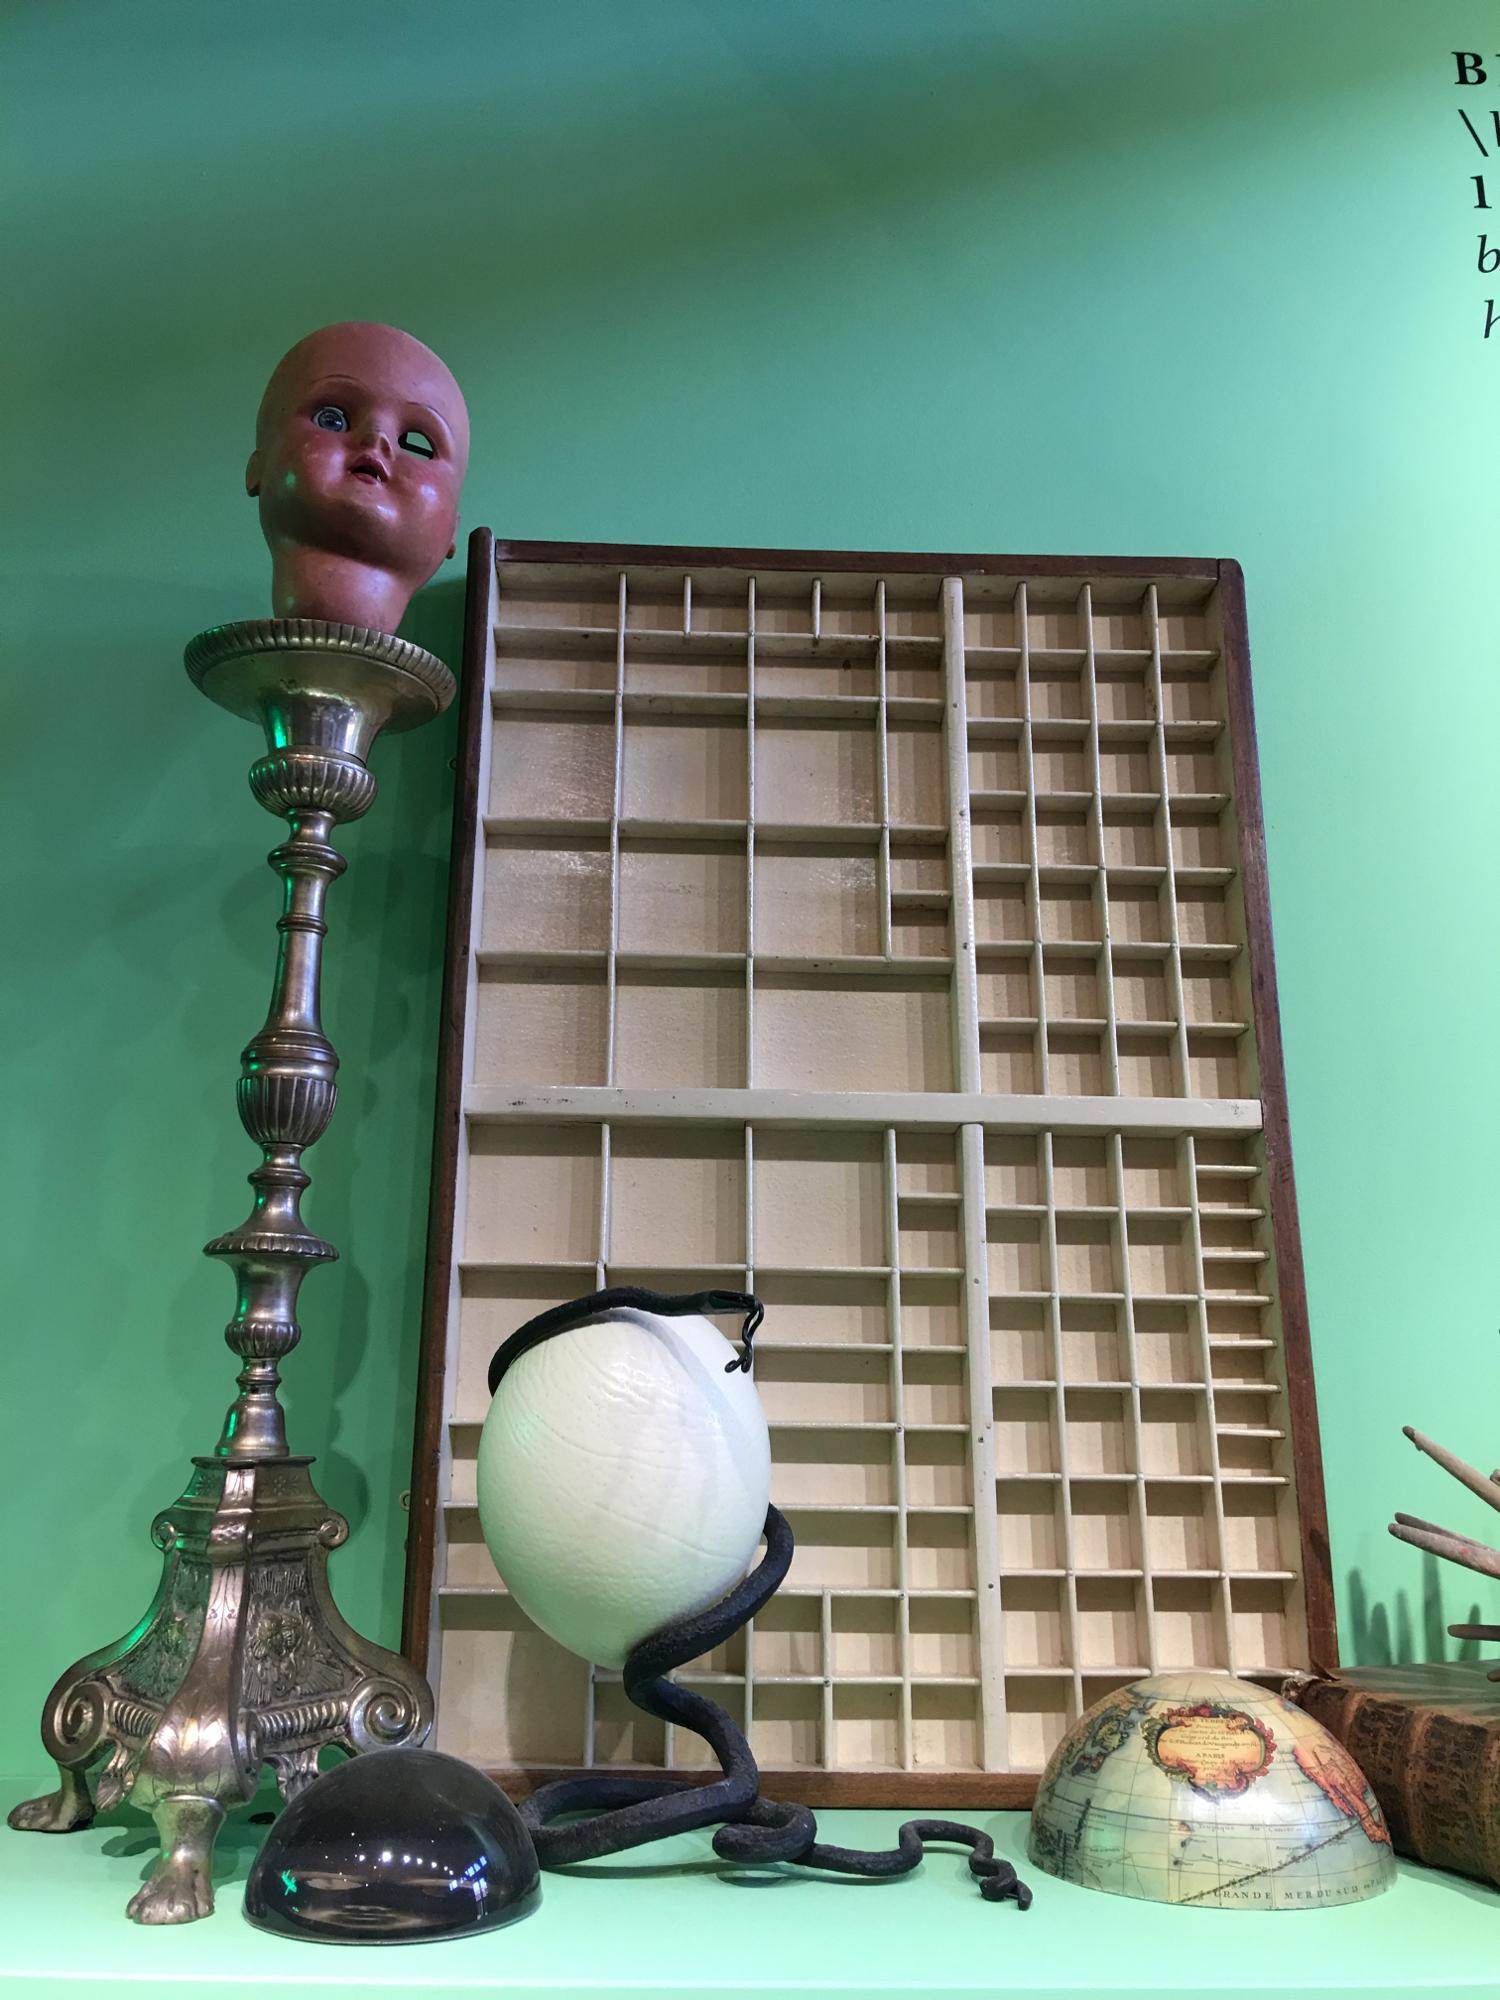 rocaille-blog-venezia-palazzo-mocenigo-cabinet-of-curiosities-collezione-storp-profumo-4